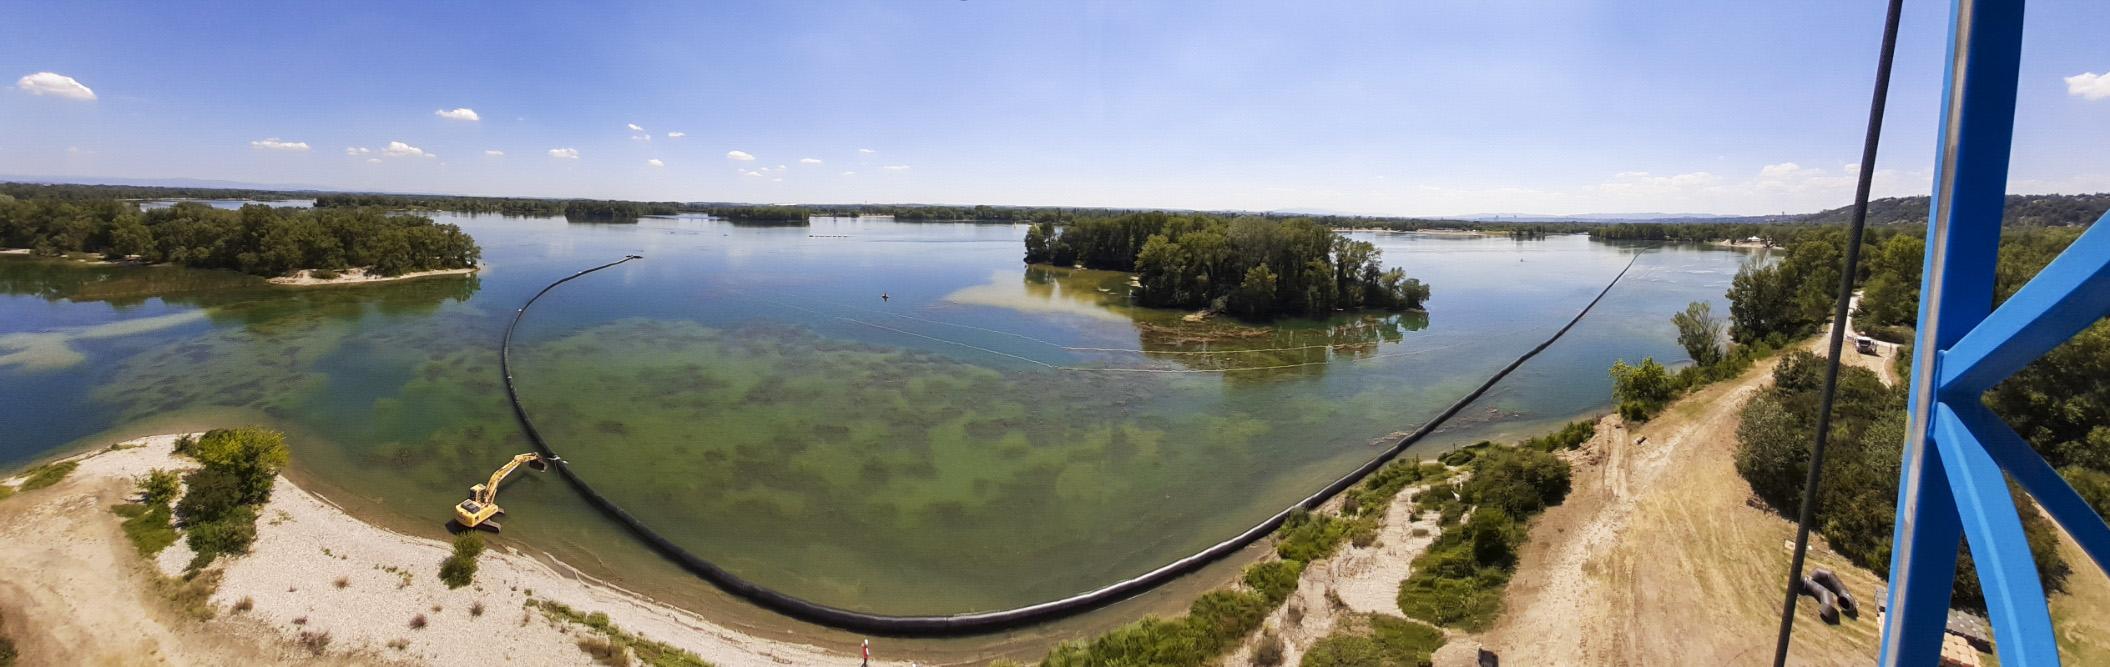 Secours alimentation eau potable Lyon